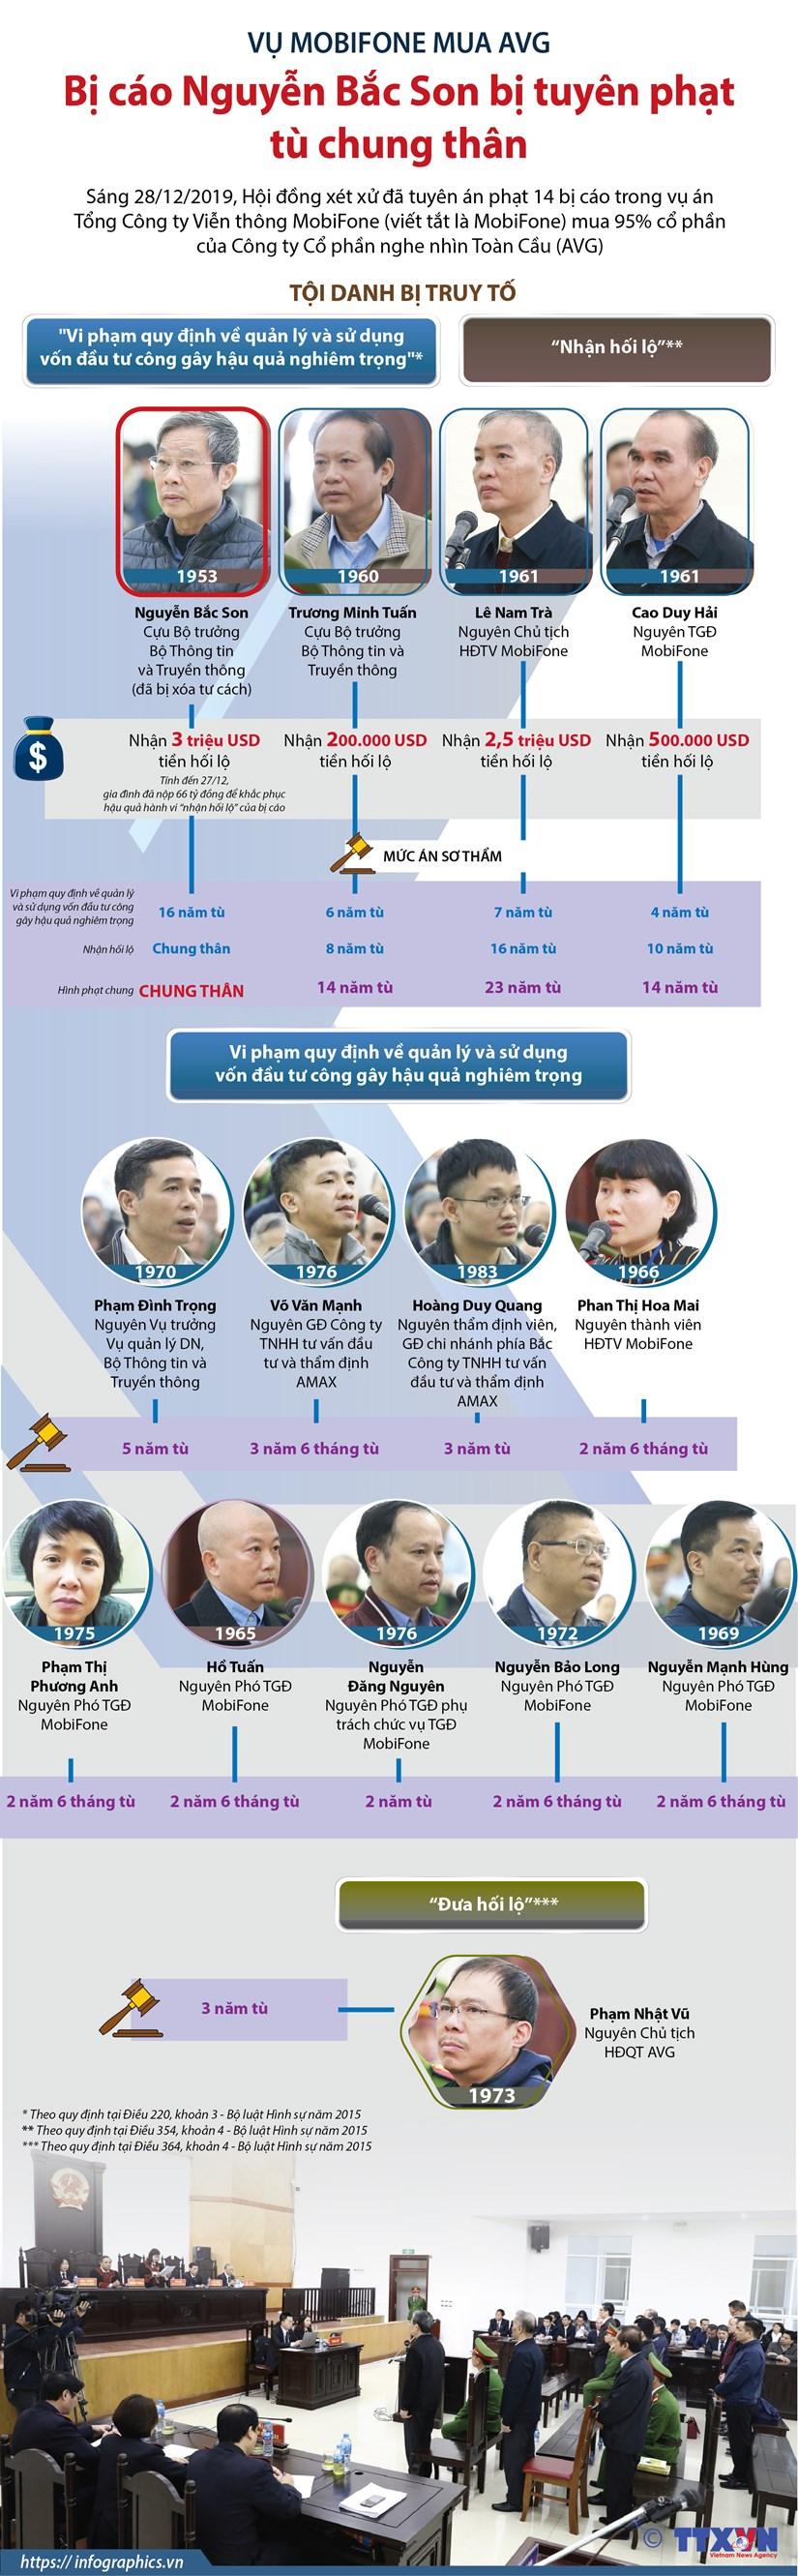 [Infographics] Bi cao Nguyen Bac Son bi tuyen phat tu chung than hinh anh 1